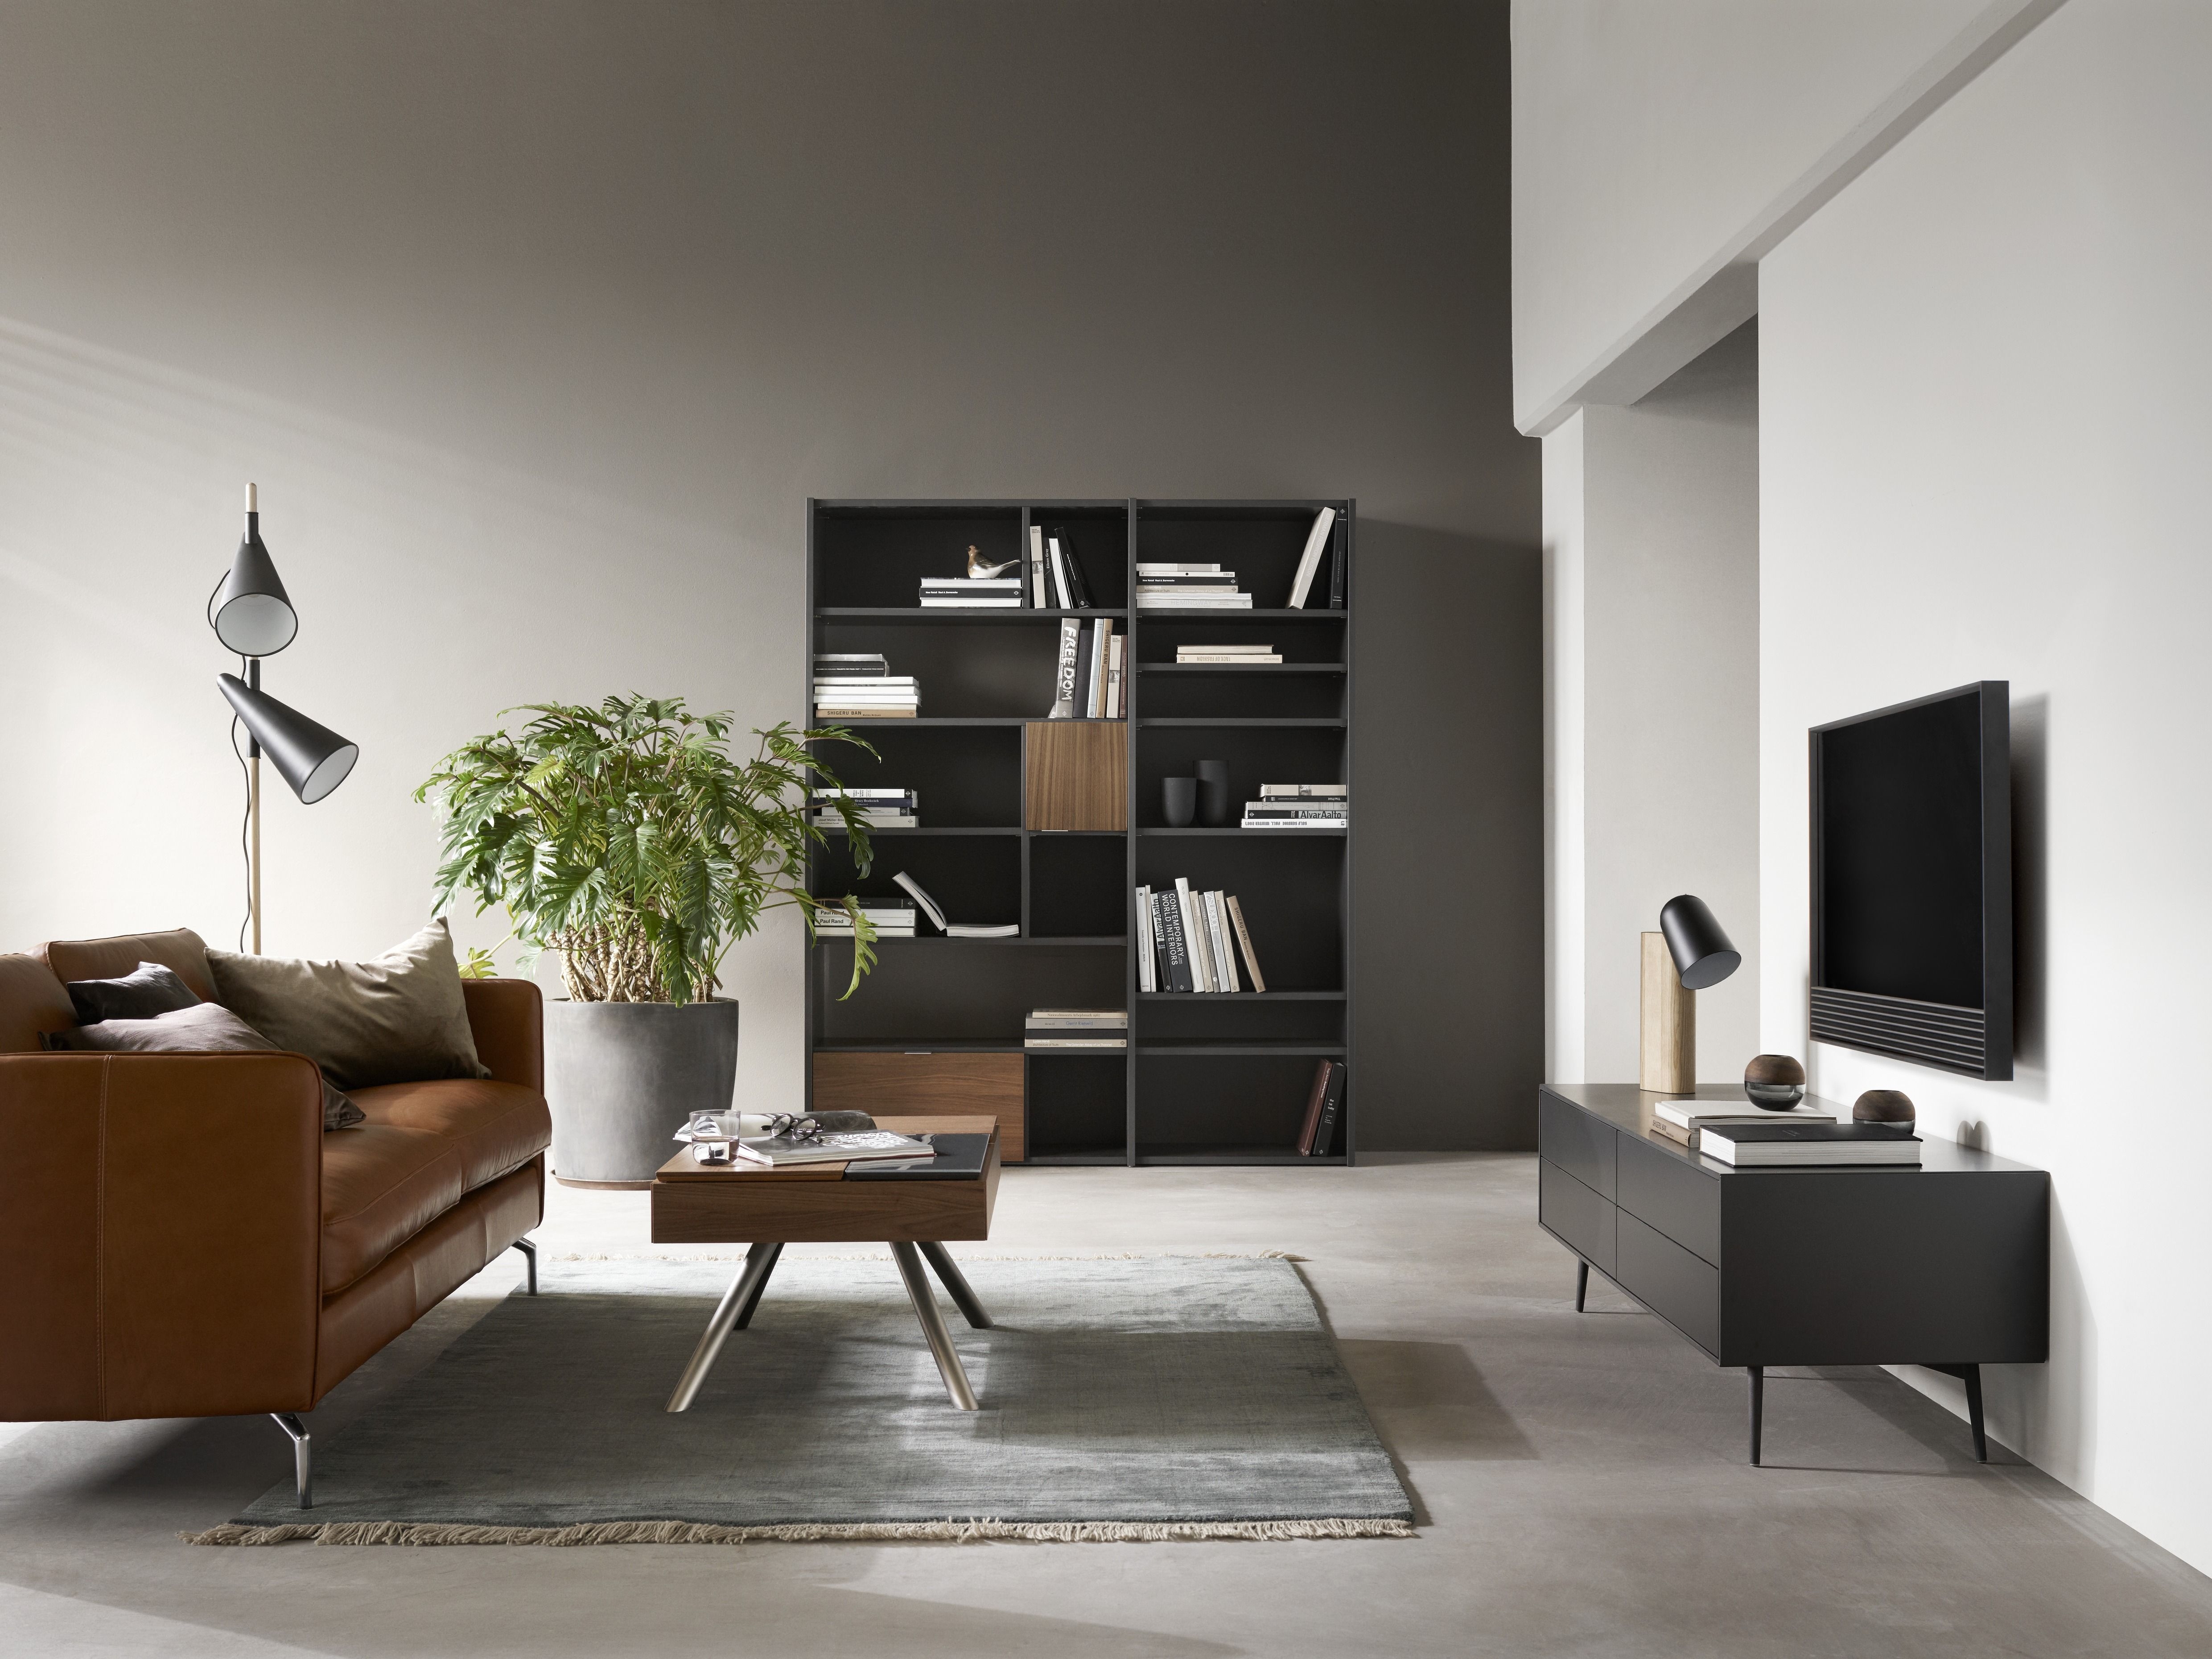 Scandi Loft Design By BoConcept Lether Sofa Black Bookcase Space Boconcept Trojmiasto Gdynia